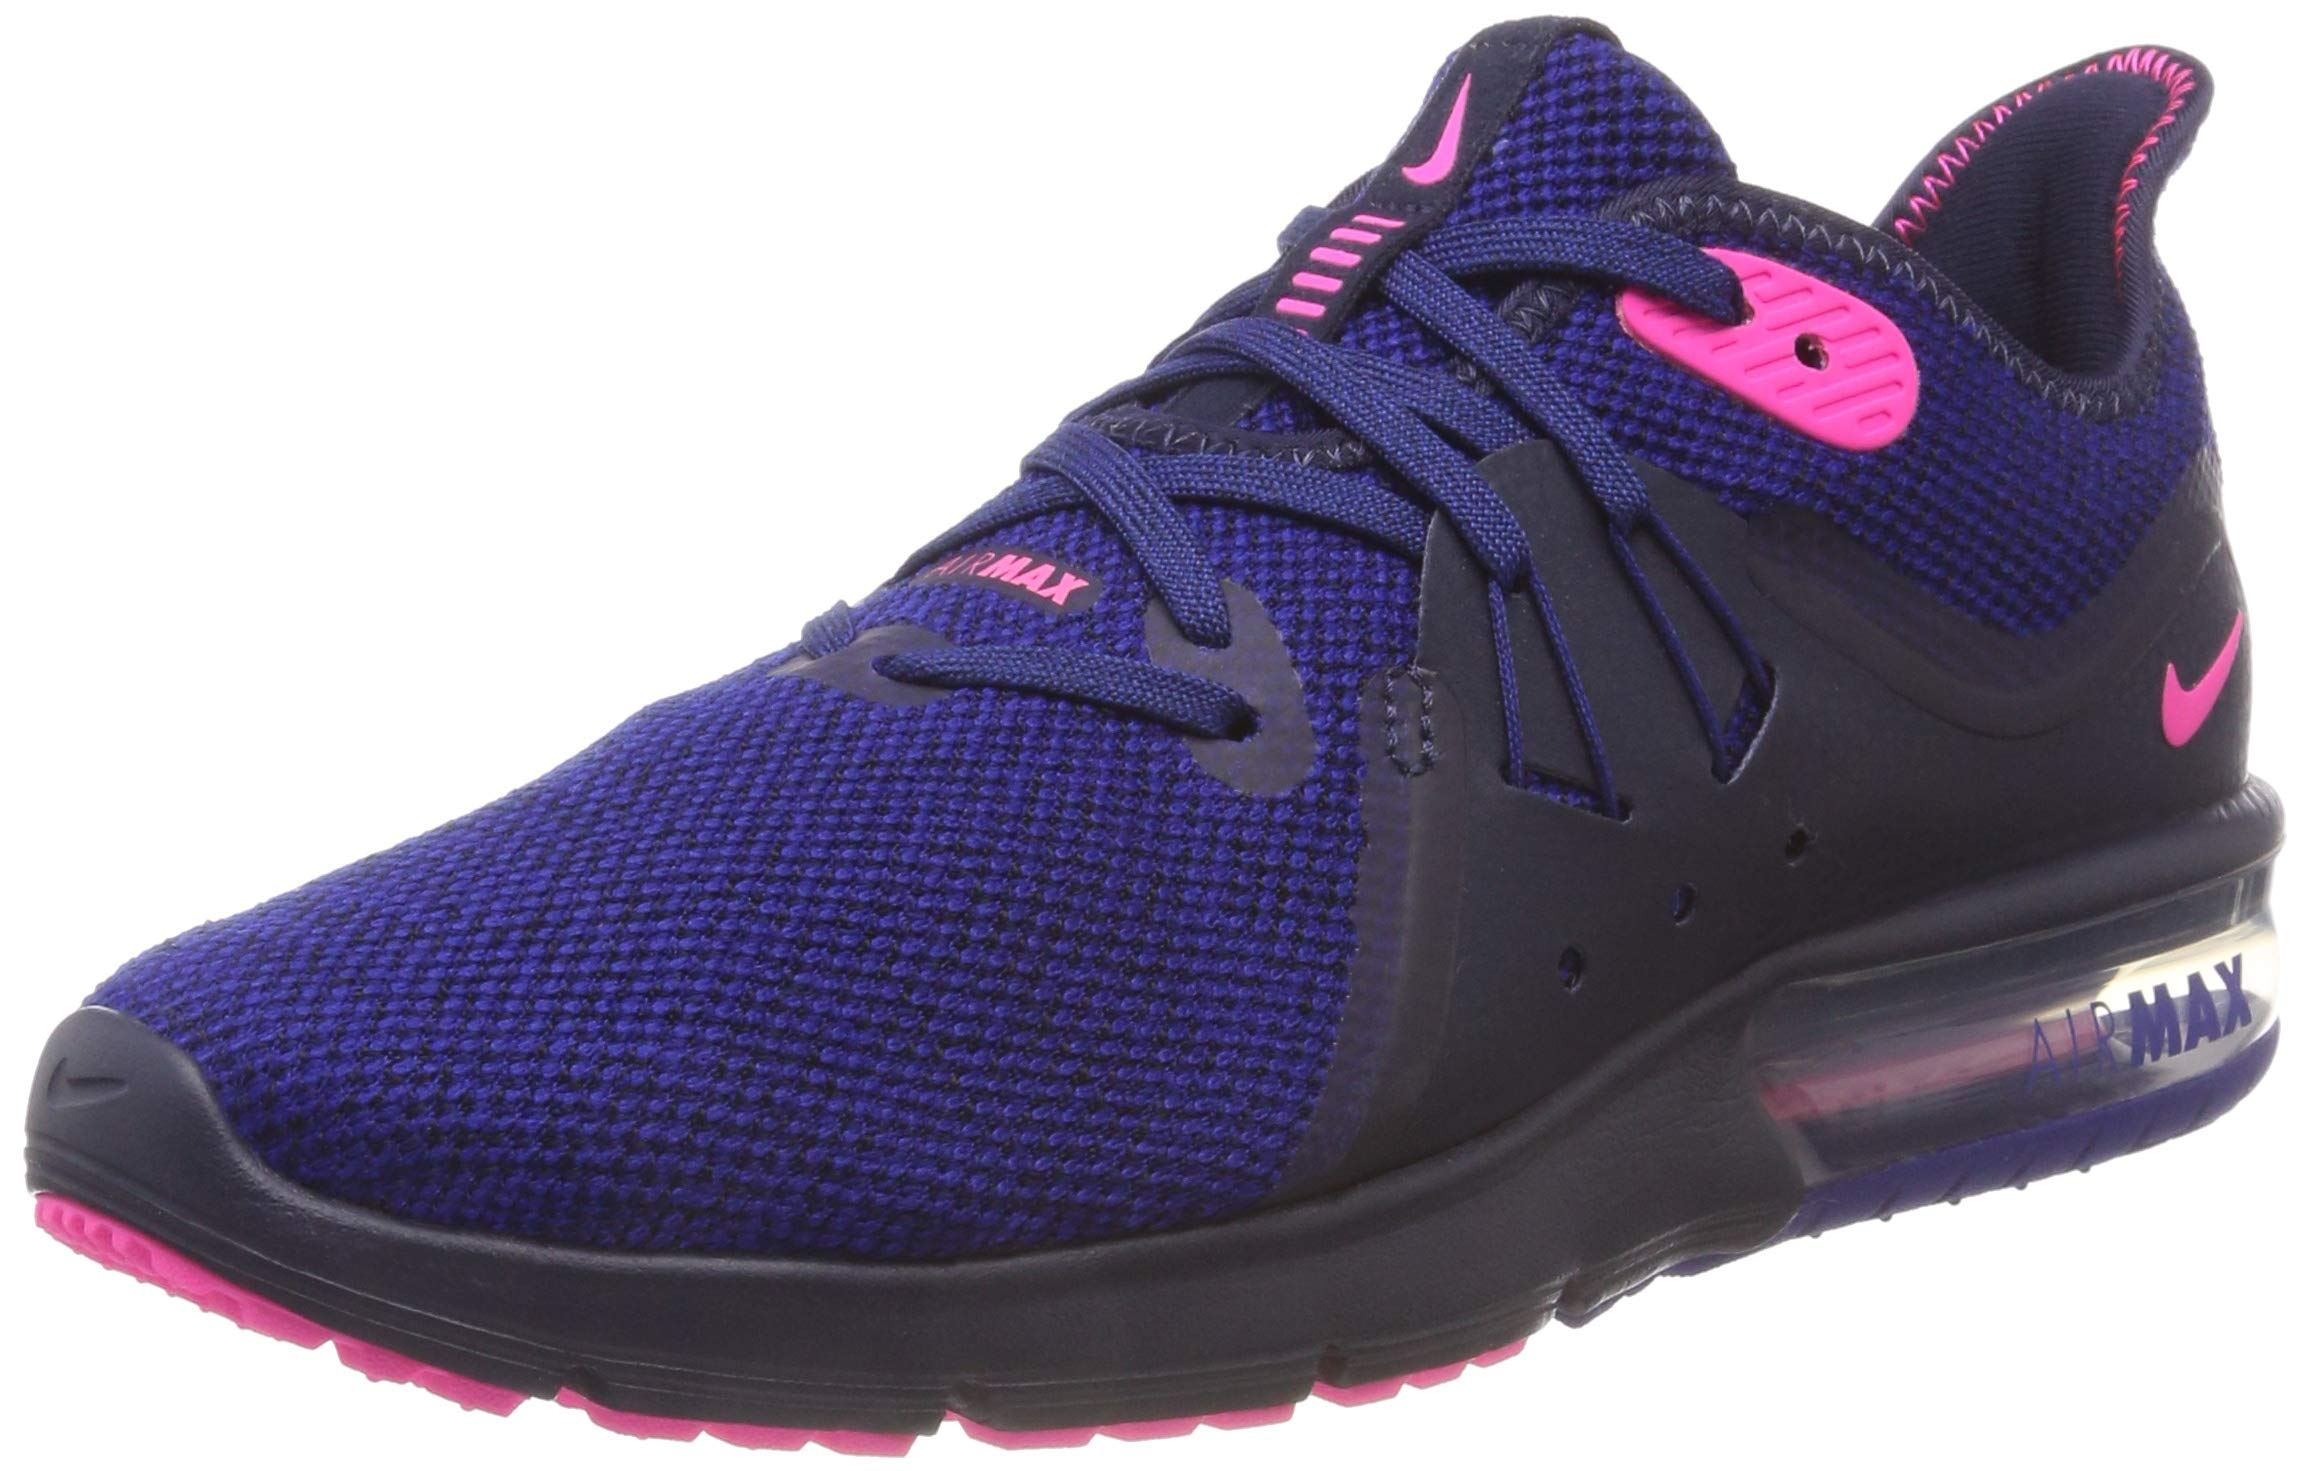 3a705573a5 Galleon - Nike Air Max Sequent 3 (11-M, Obsidian/Pink Blast/Deep Royal Blue)